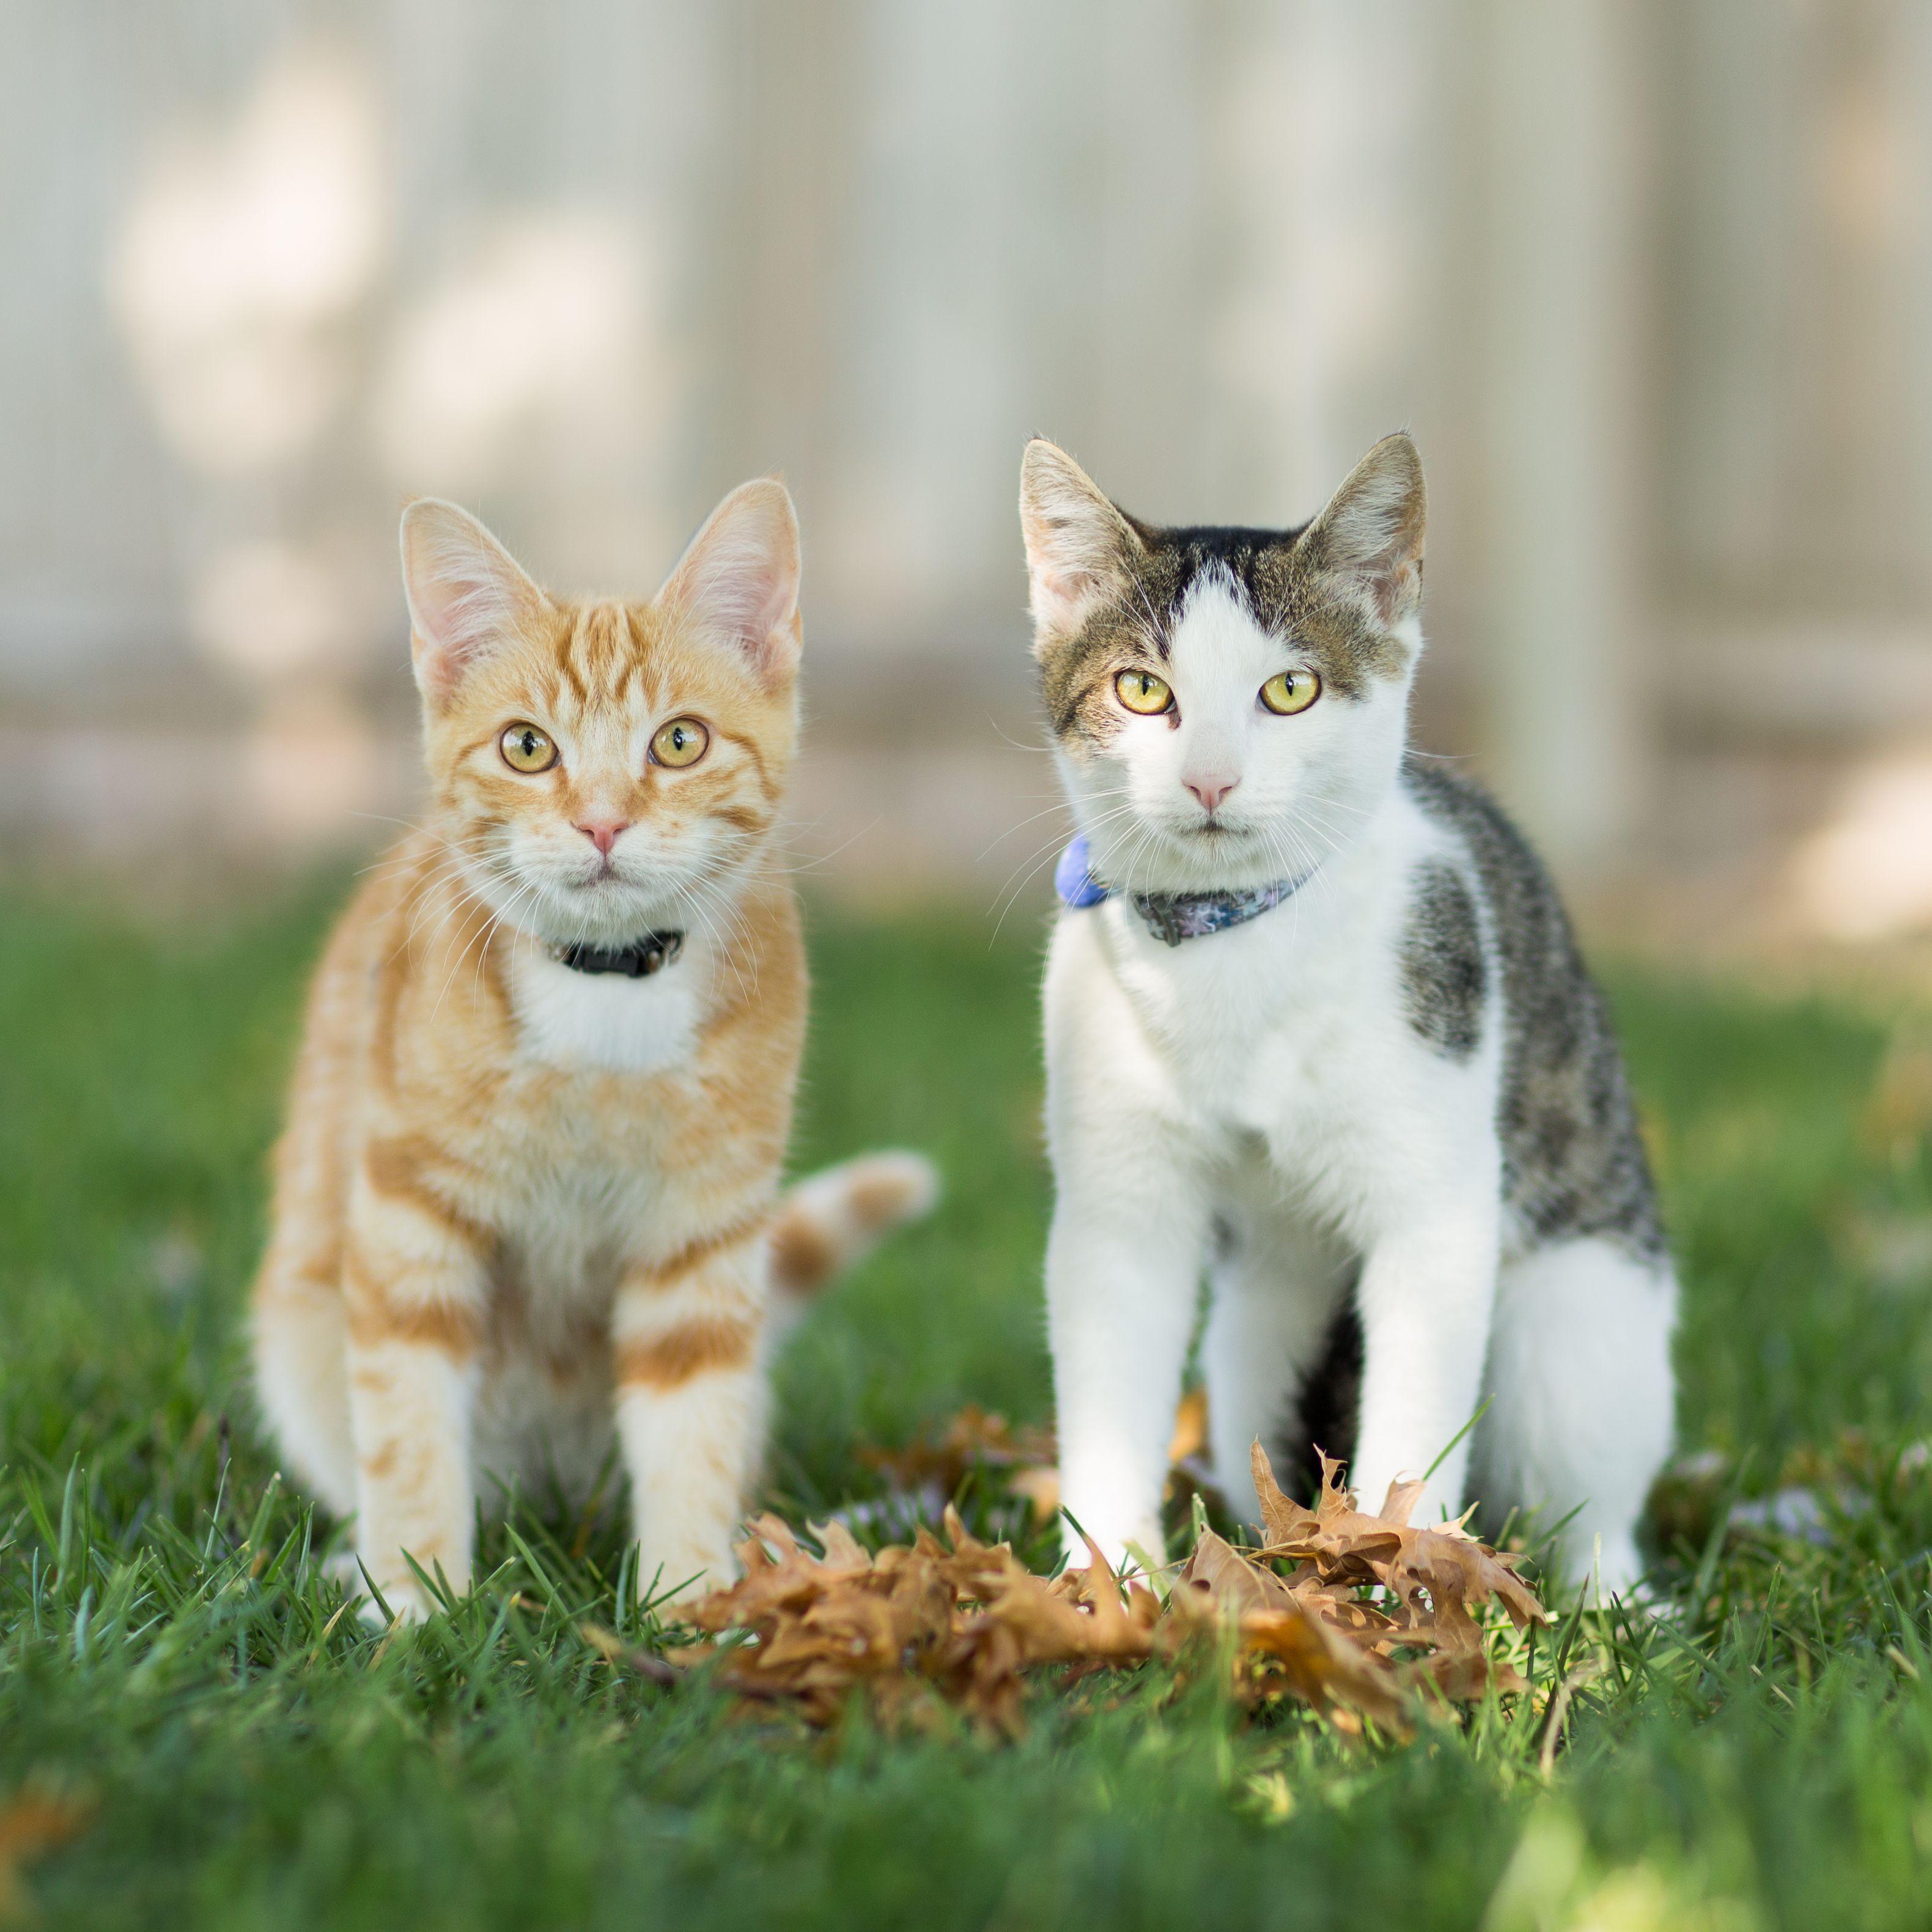 anti worm medication cats